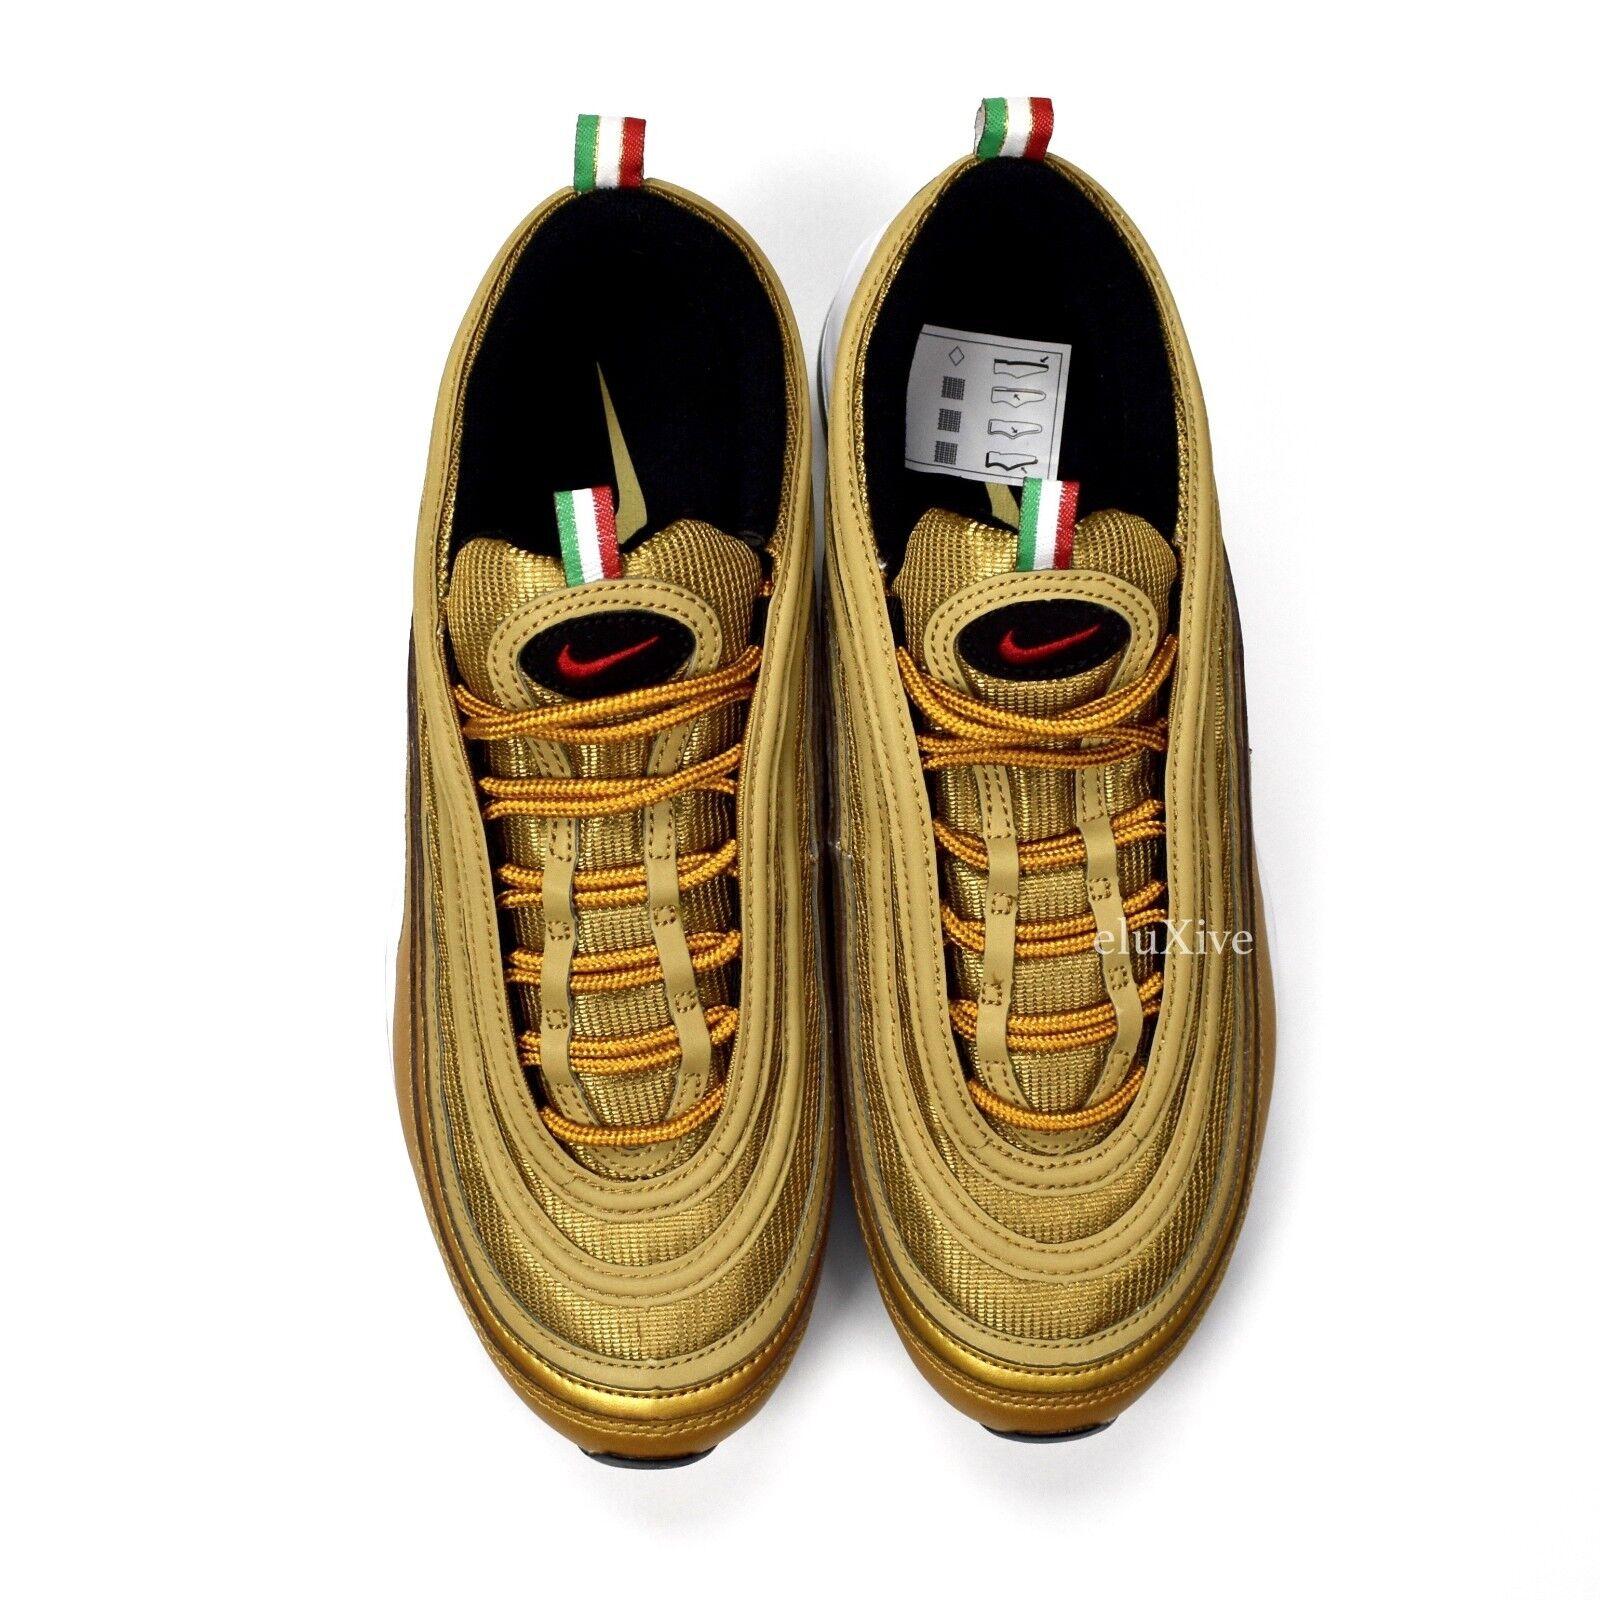 28 gemeinden nike männer air max 97 es männer nike metallisches gold italien flagge turnschuhe ds 2018 verbindlich 9e40e2